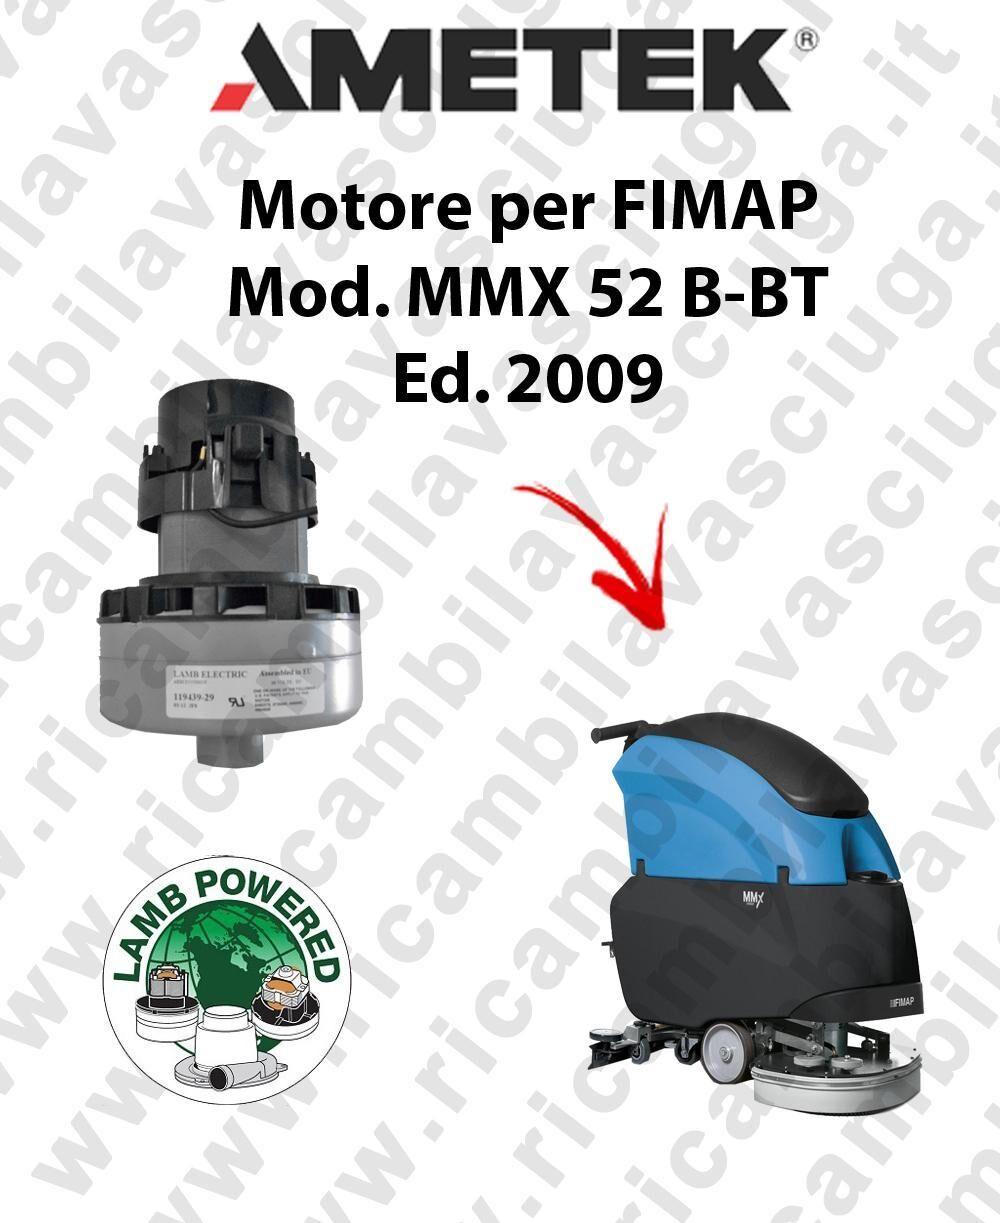 Fimap MMX 52 B-BT Ed. 2009 MOTORE aspirazione LAMB AMETEK lavapavimenti